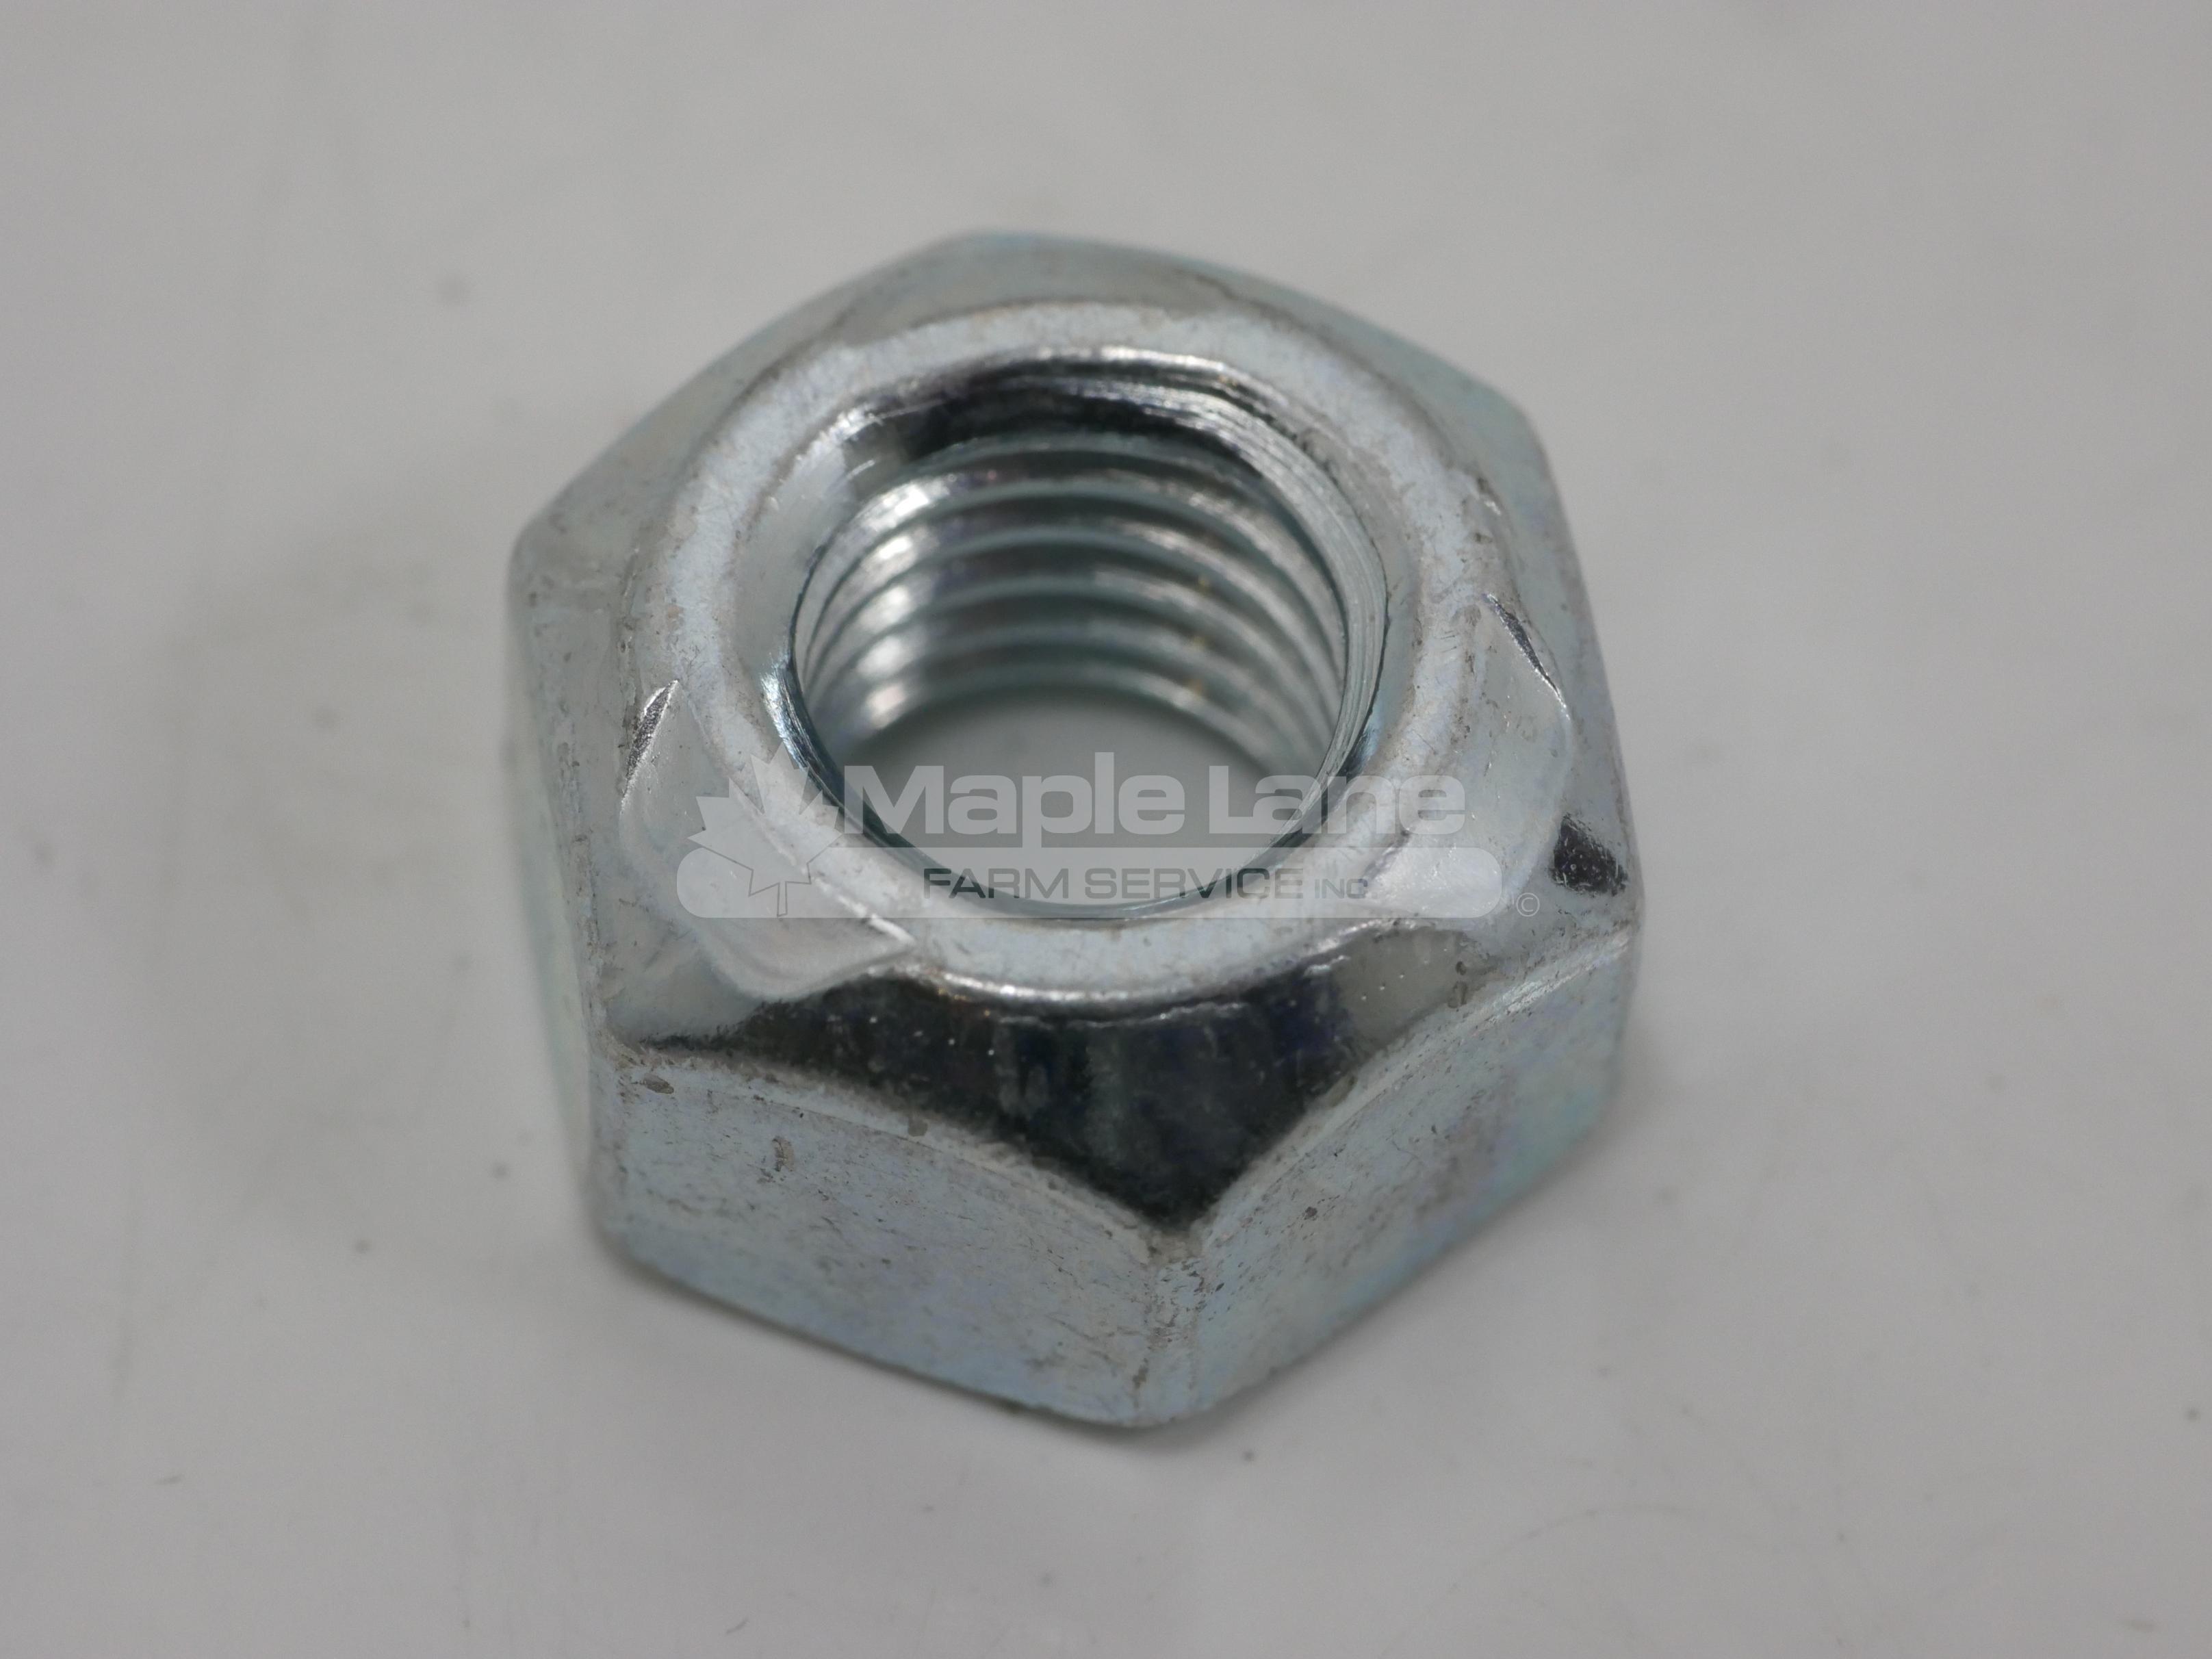 1441932X1 Top Lock Nut M10-1.5